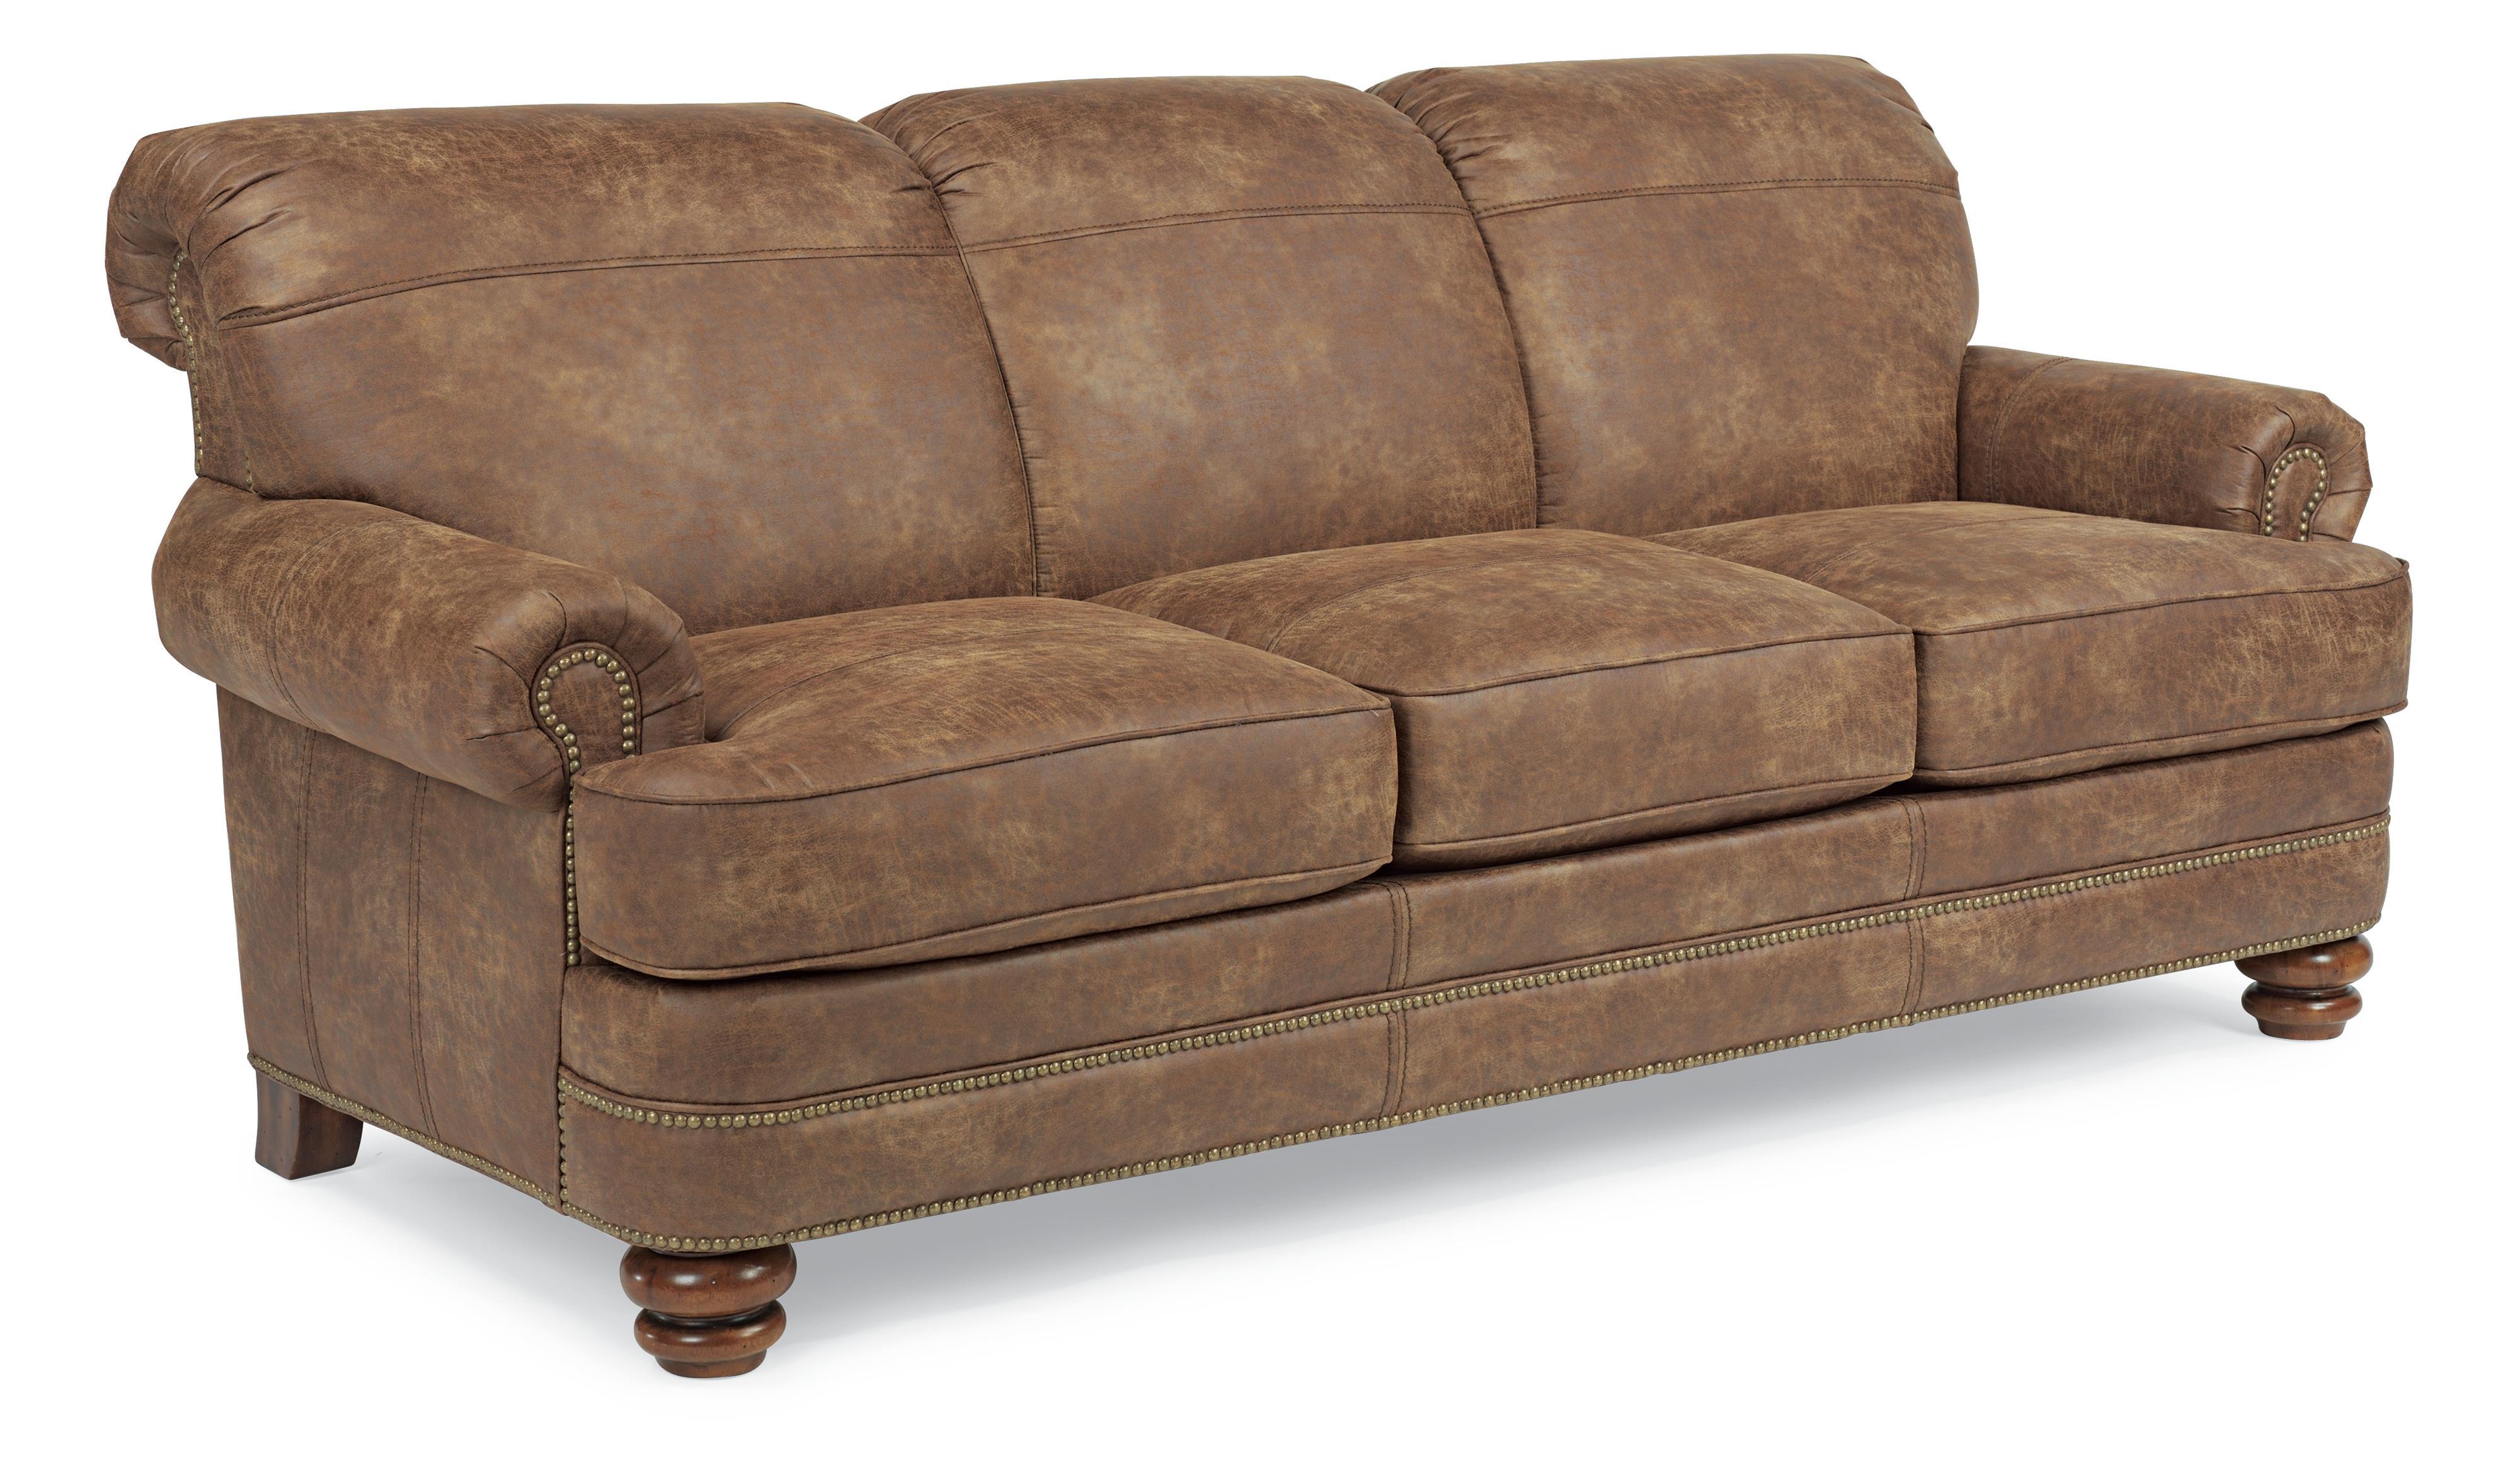 traditional sofa manufacturers uk ethan allen meyer table flexsteel bay bridge n7791 31 rolled back